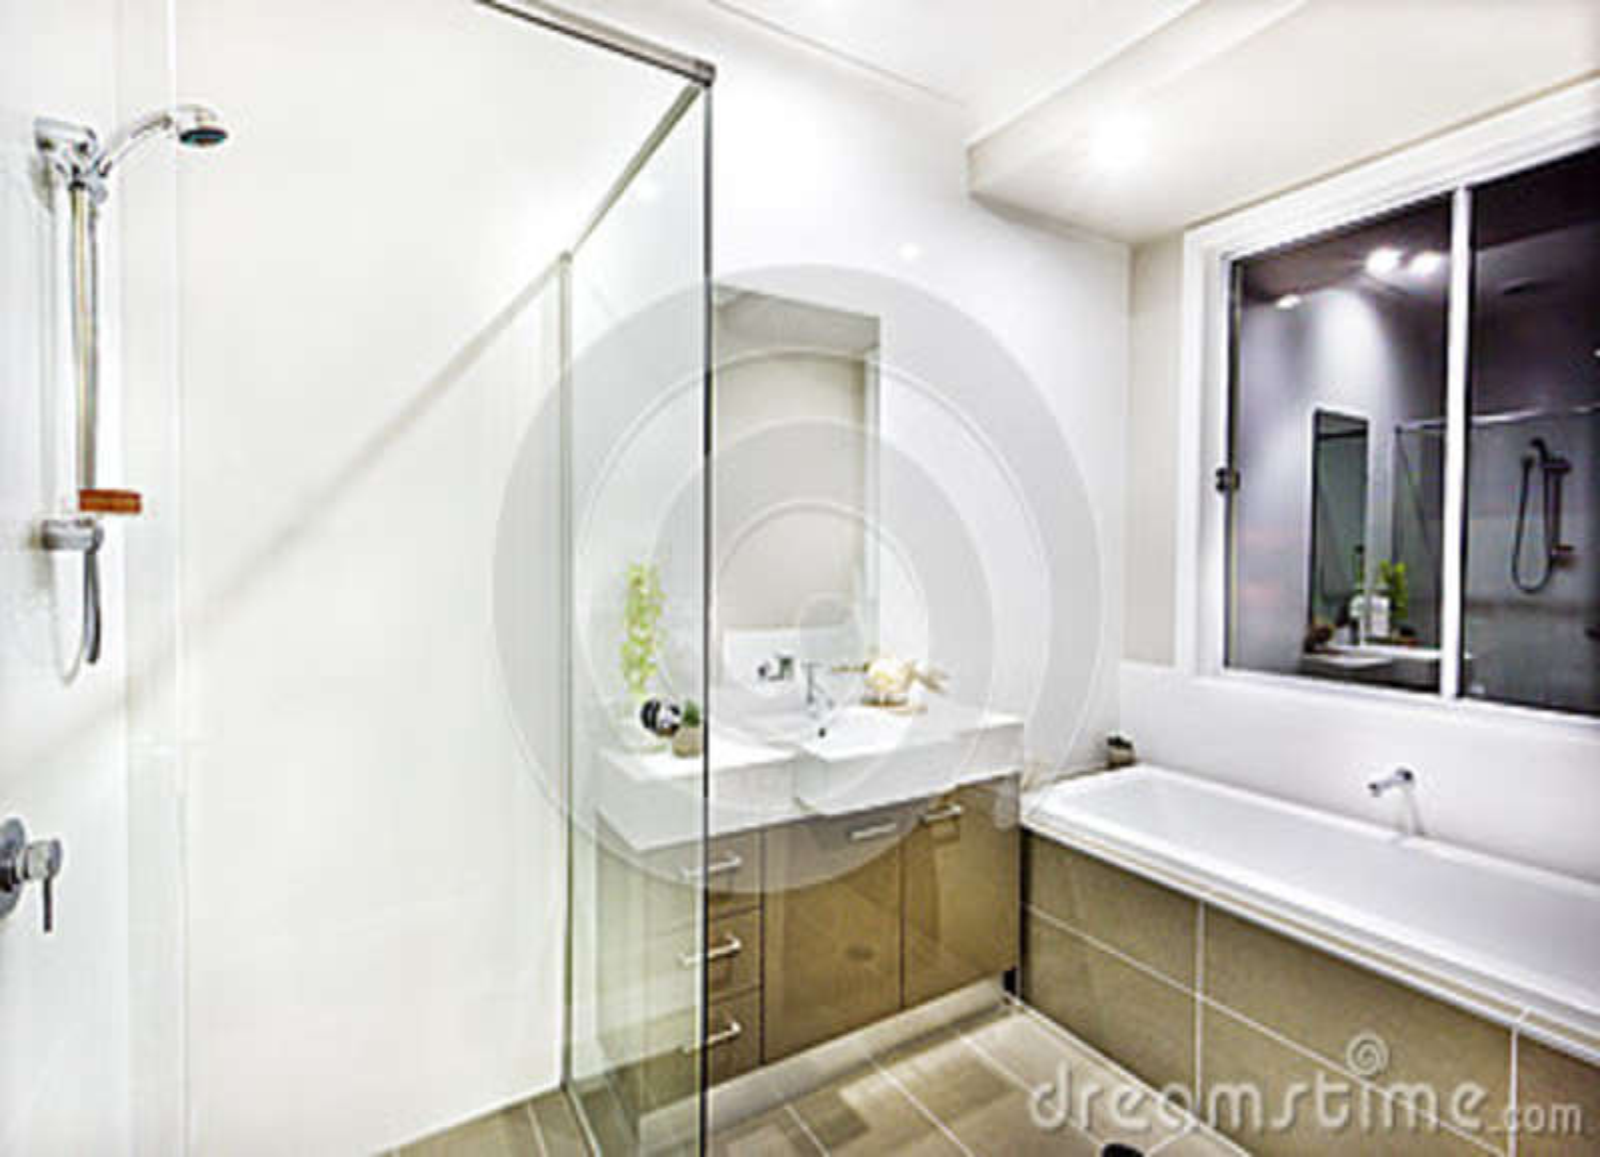 Cuarto de ba o moderno con un grifo una tina de agua y baldosas foto de archivo imagen de Grifos modernos bano